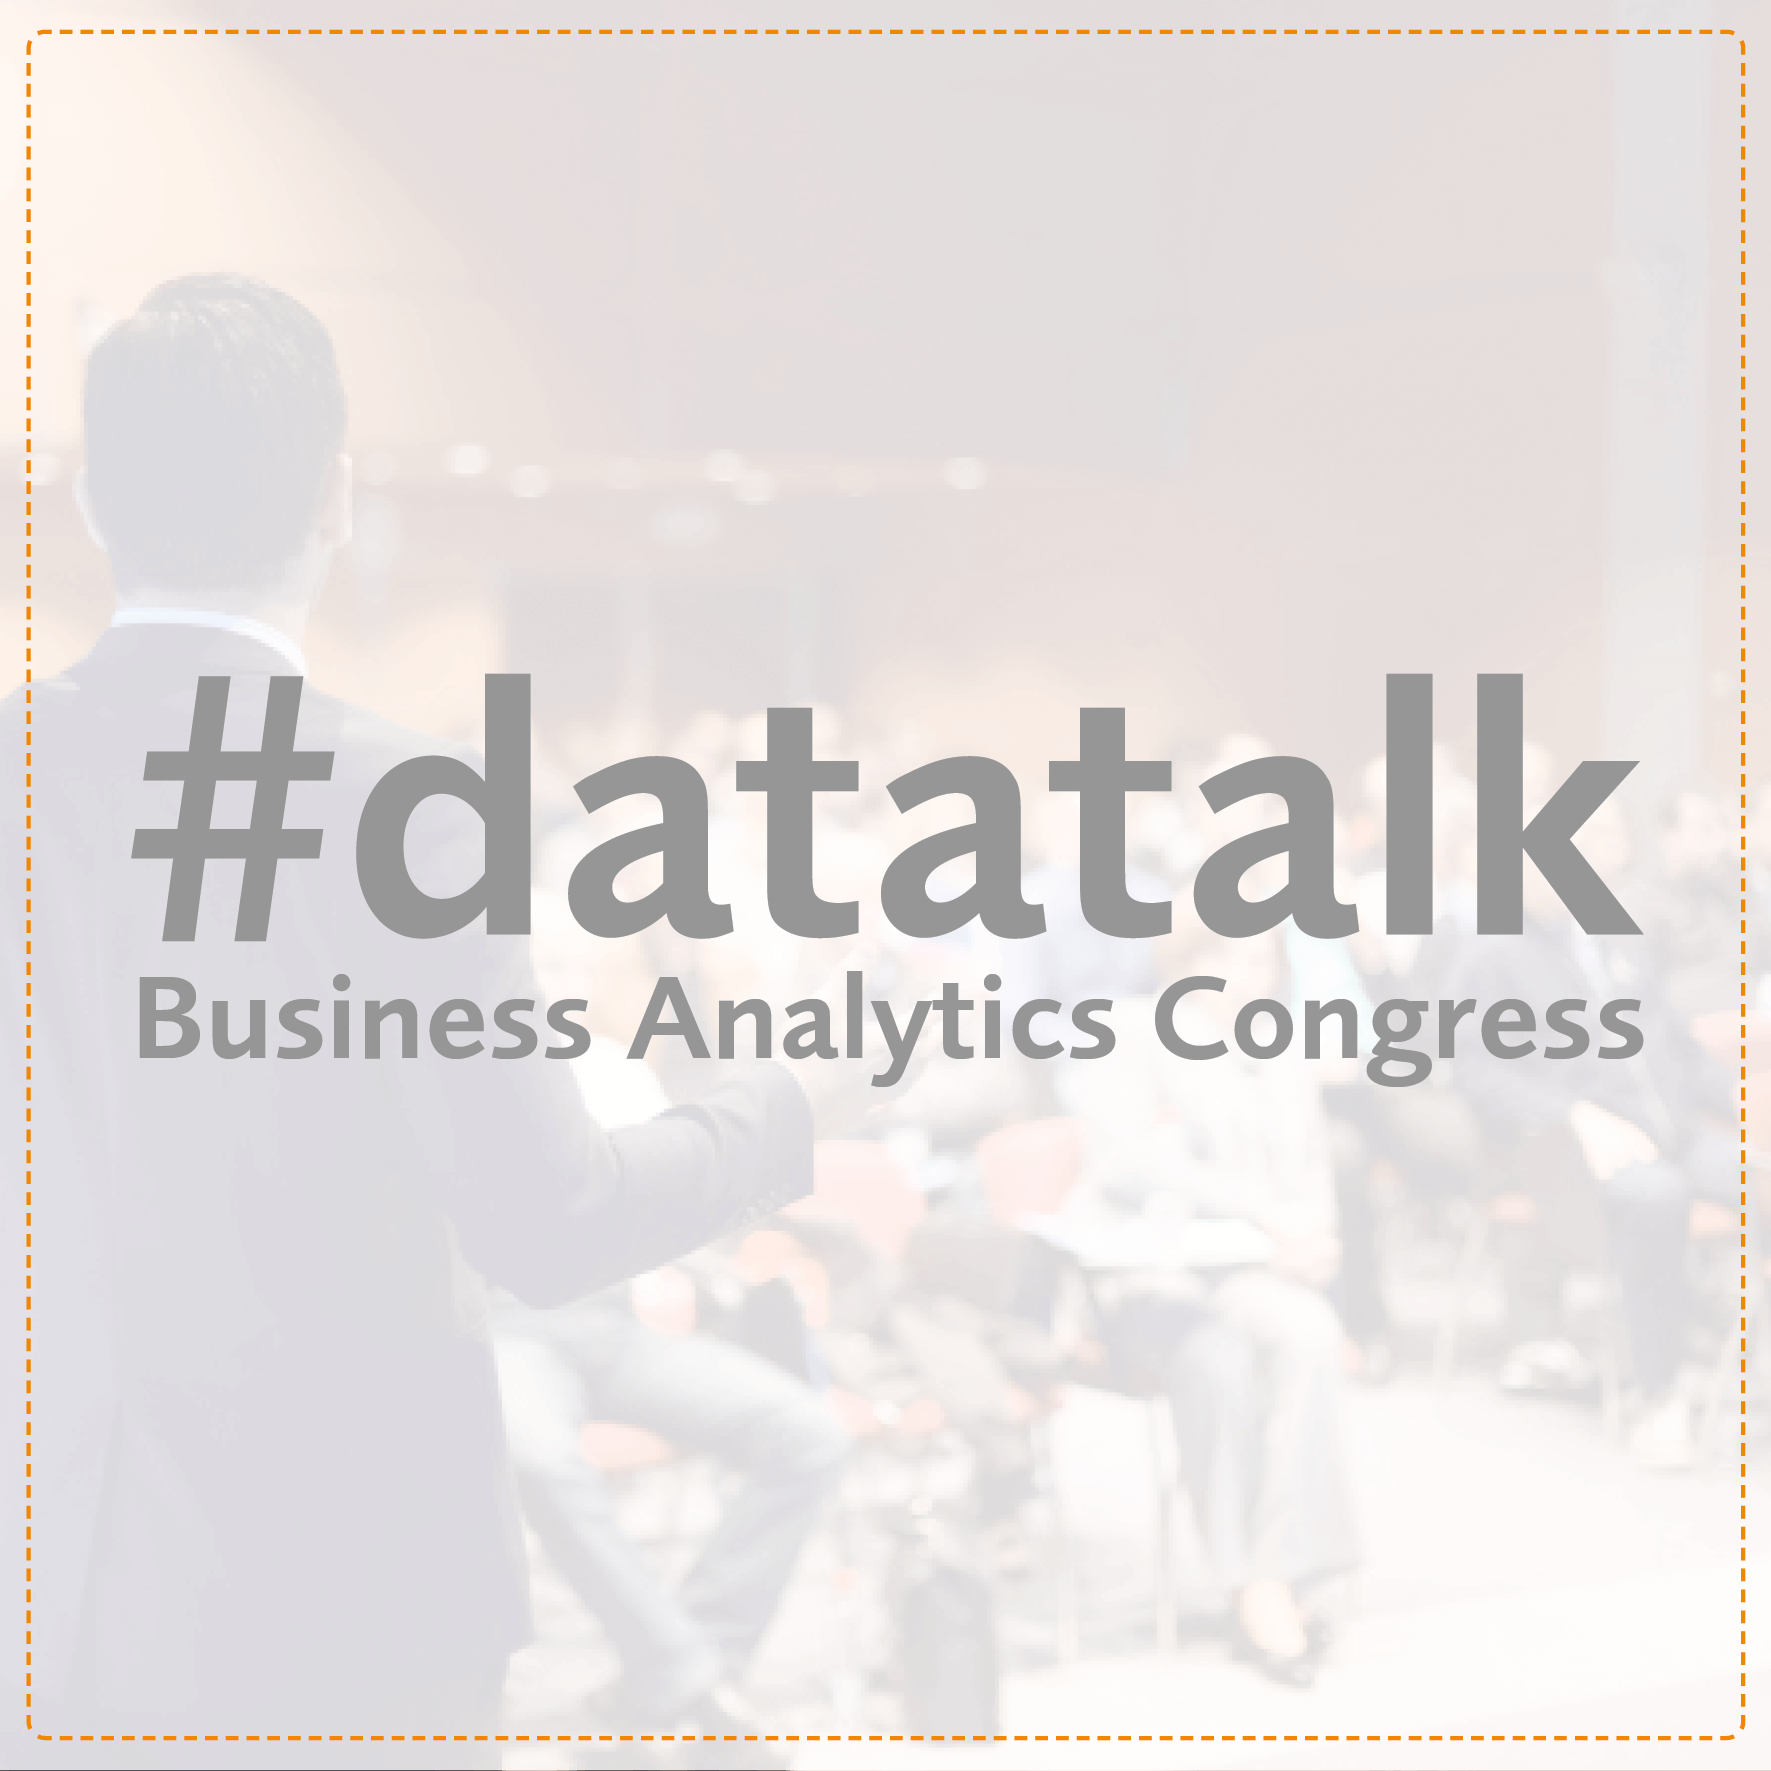 #datatalk Business Analytics Congress